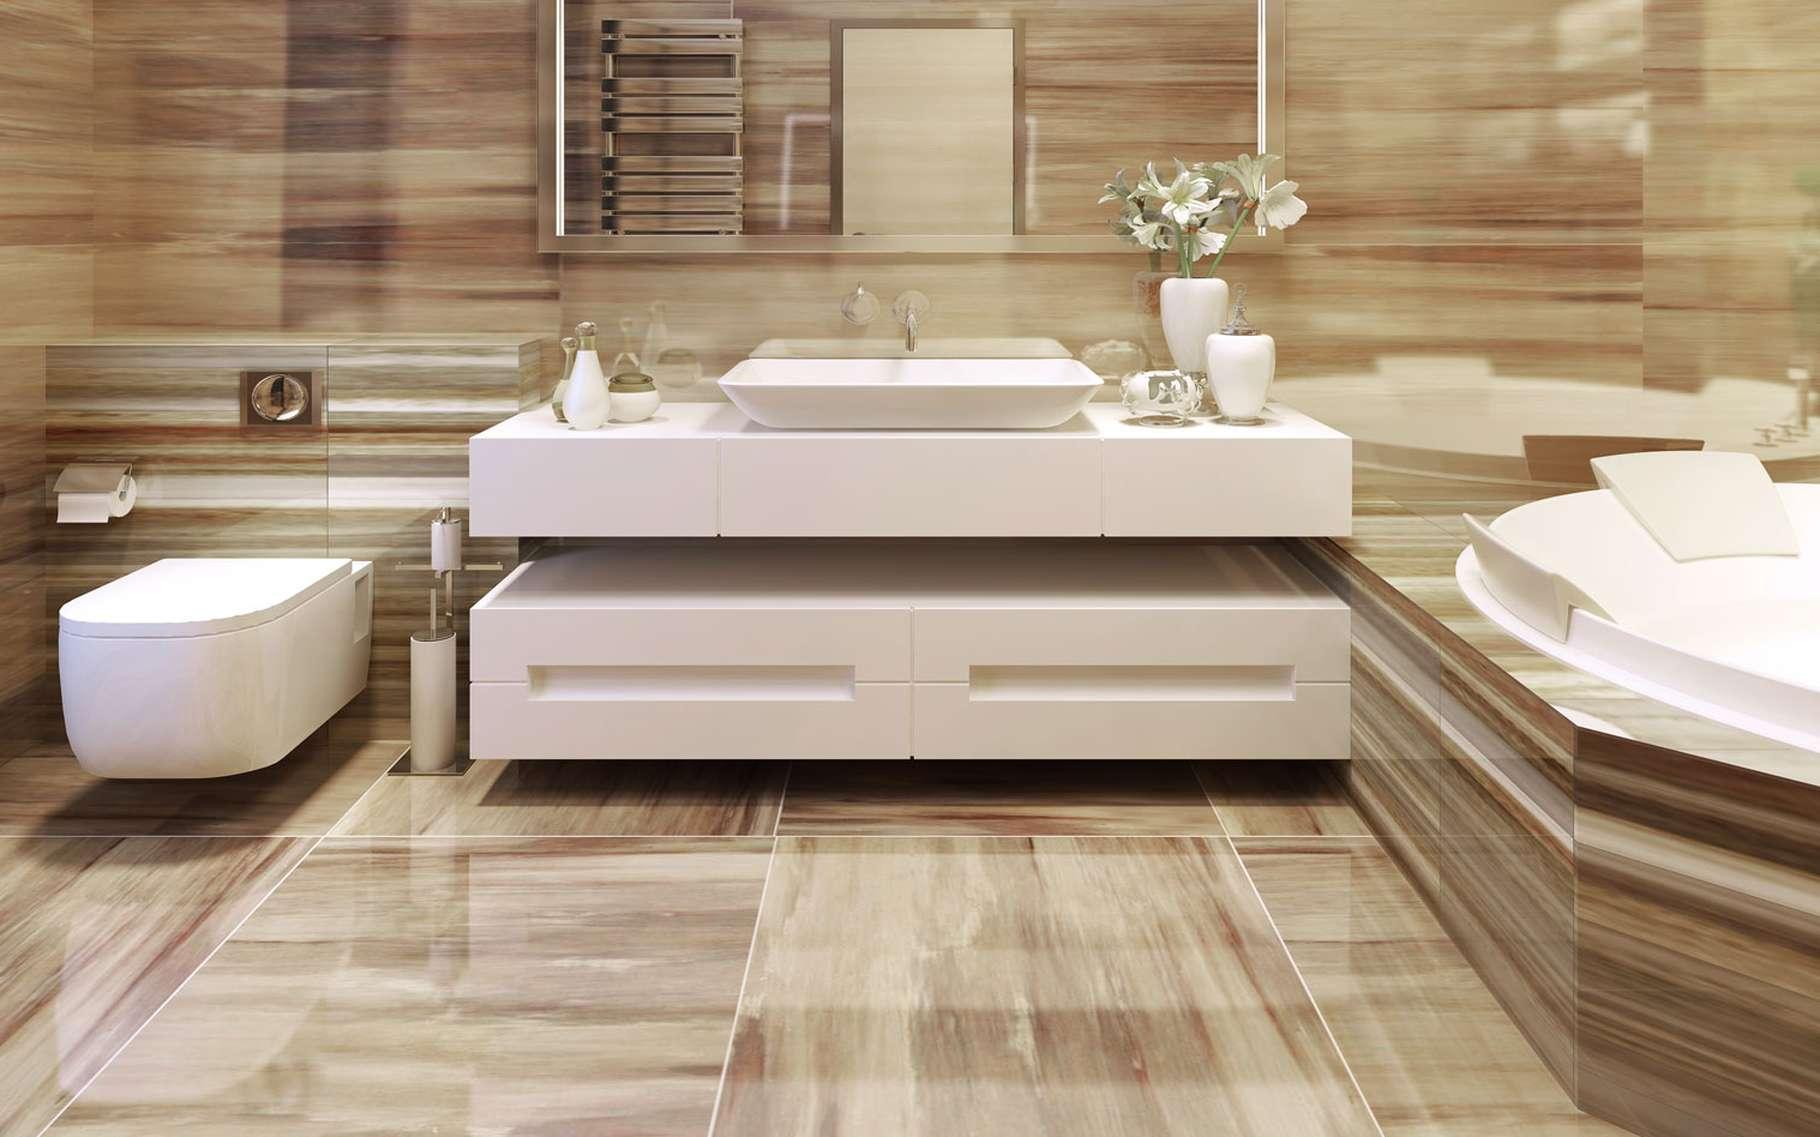 Osb Dans Salle De Bain rénover sa salle de bain étape par étape | dossier